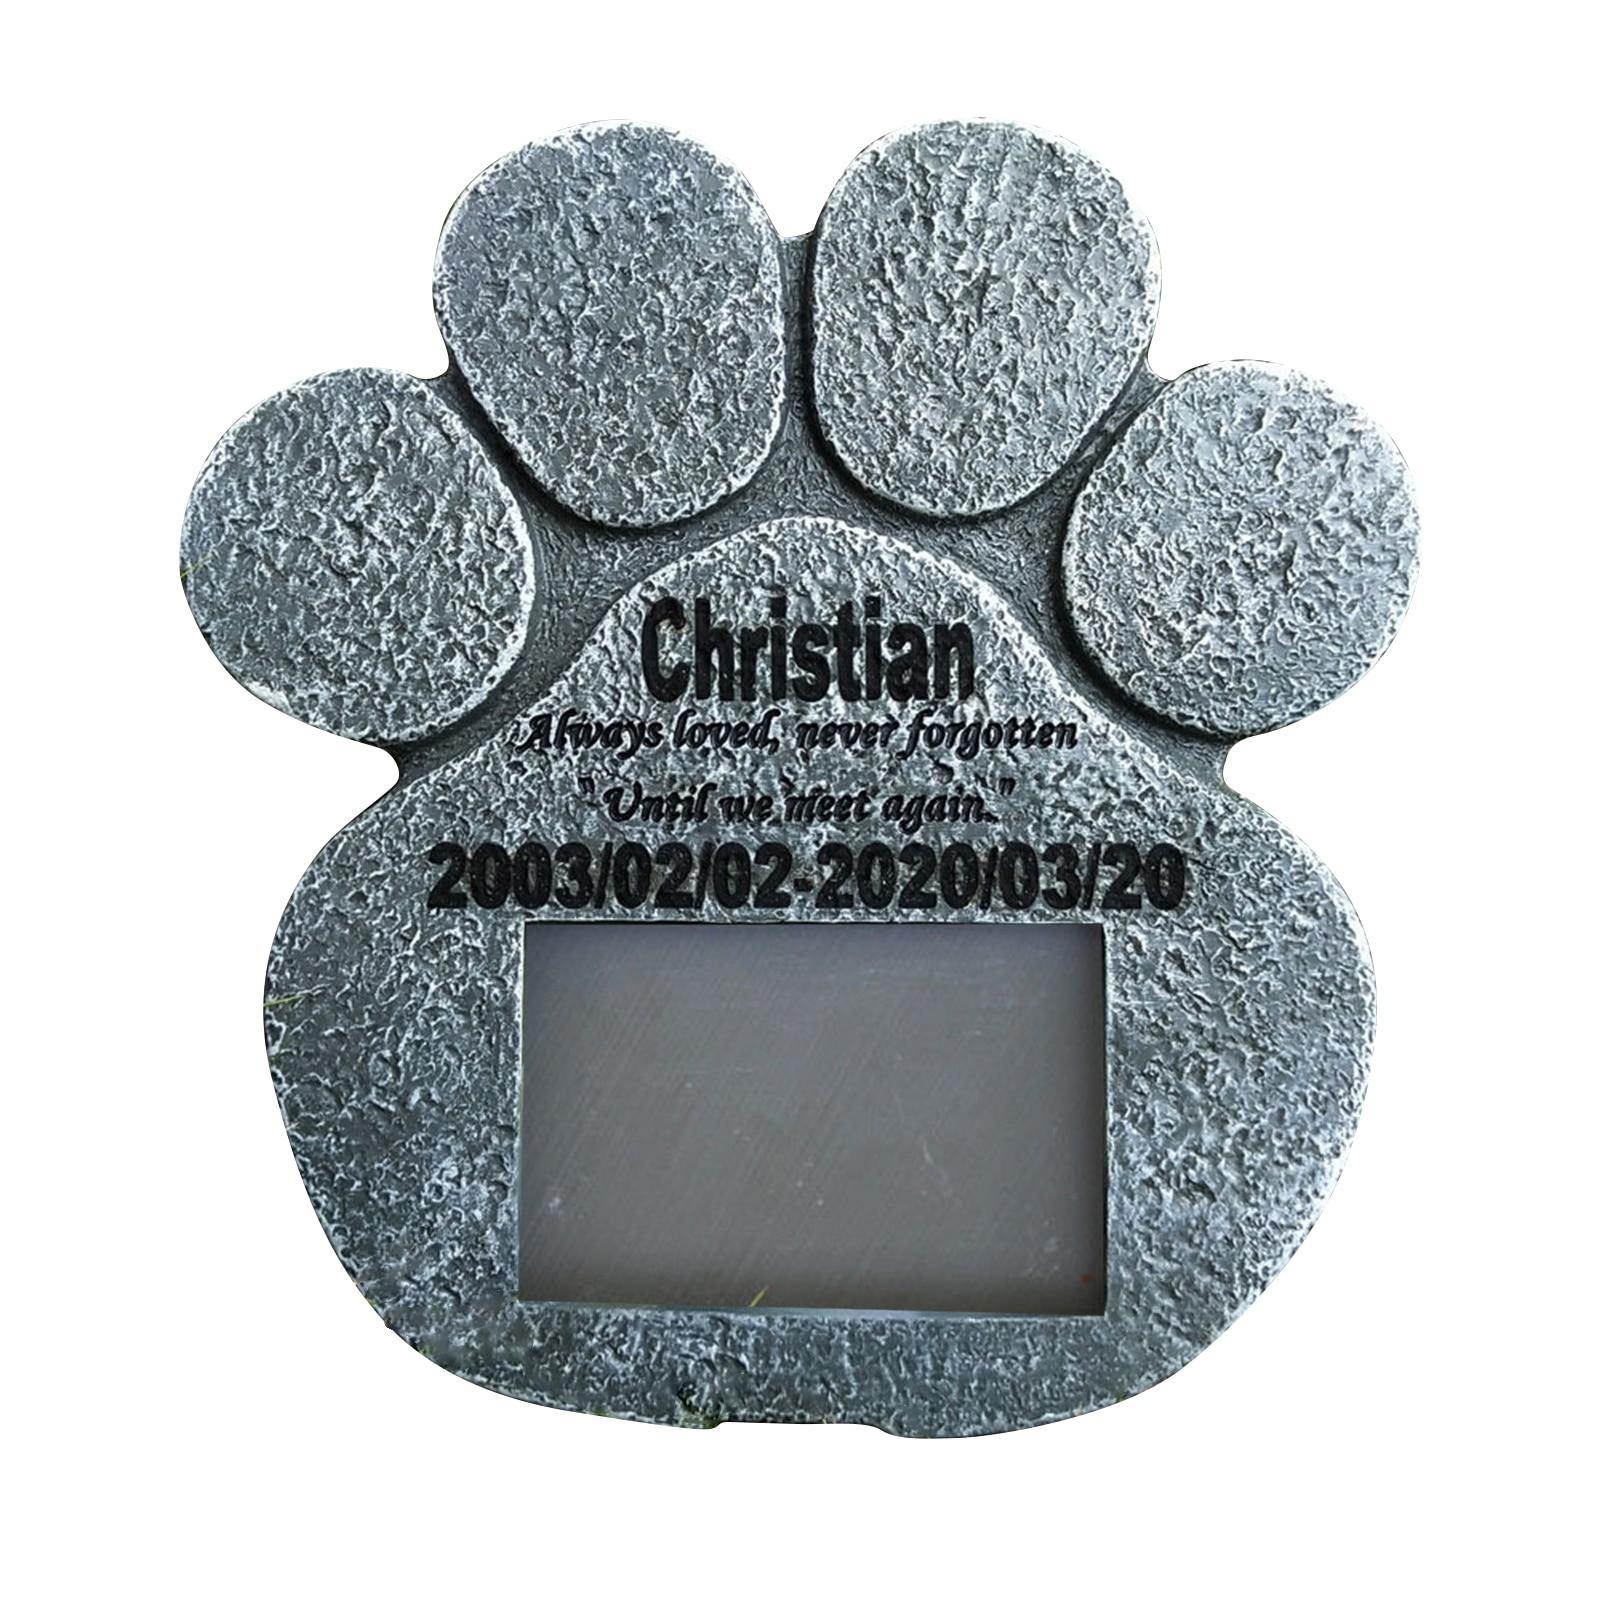 Personalized Pet Memorial Stone Indoor Outdoor For Garden Backyard Marker Loss Of Pet Gift Paw Print Pet Tombstone